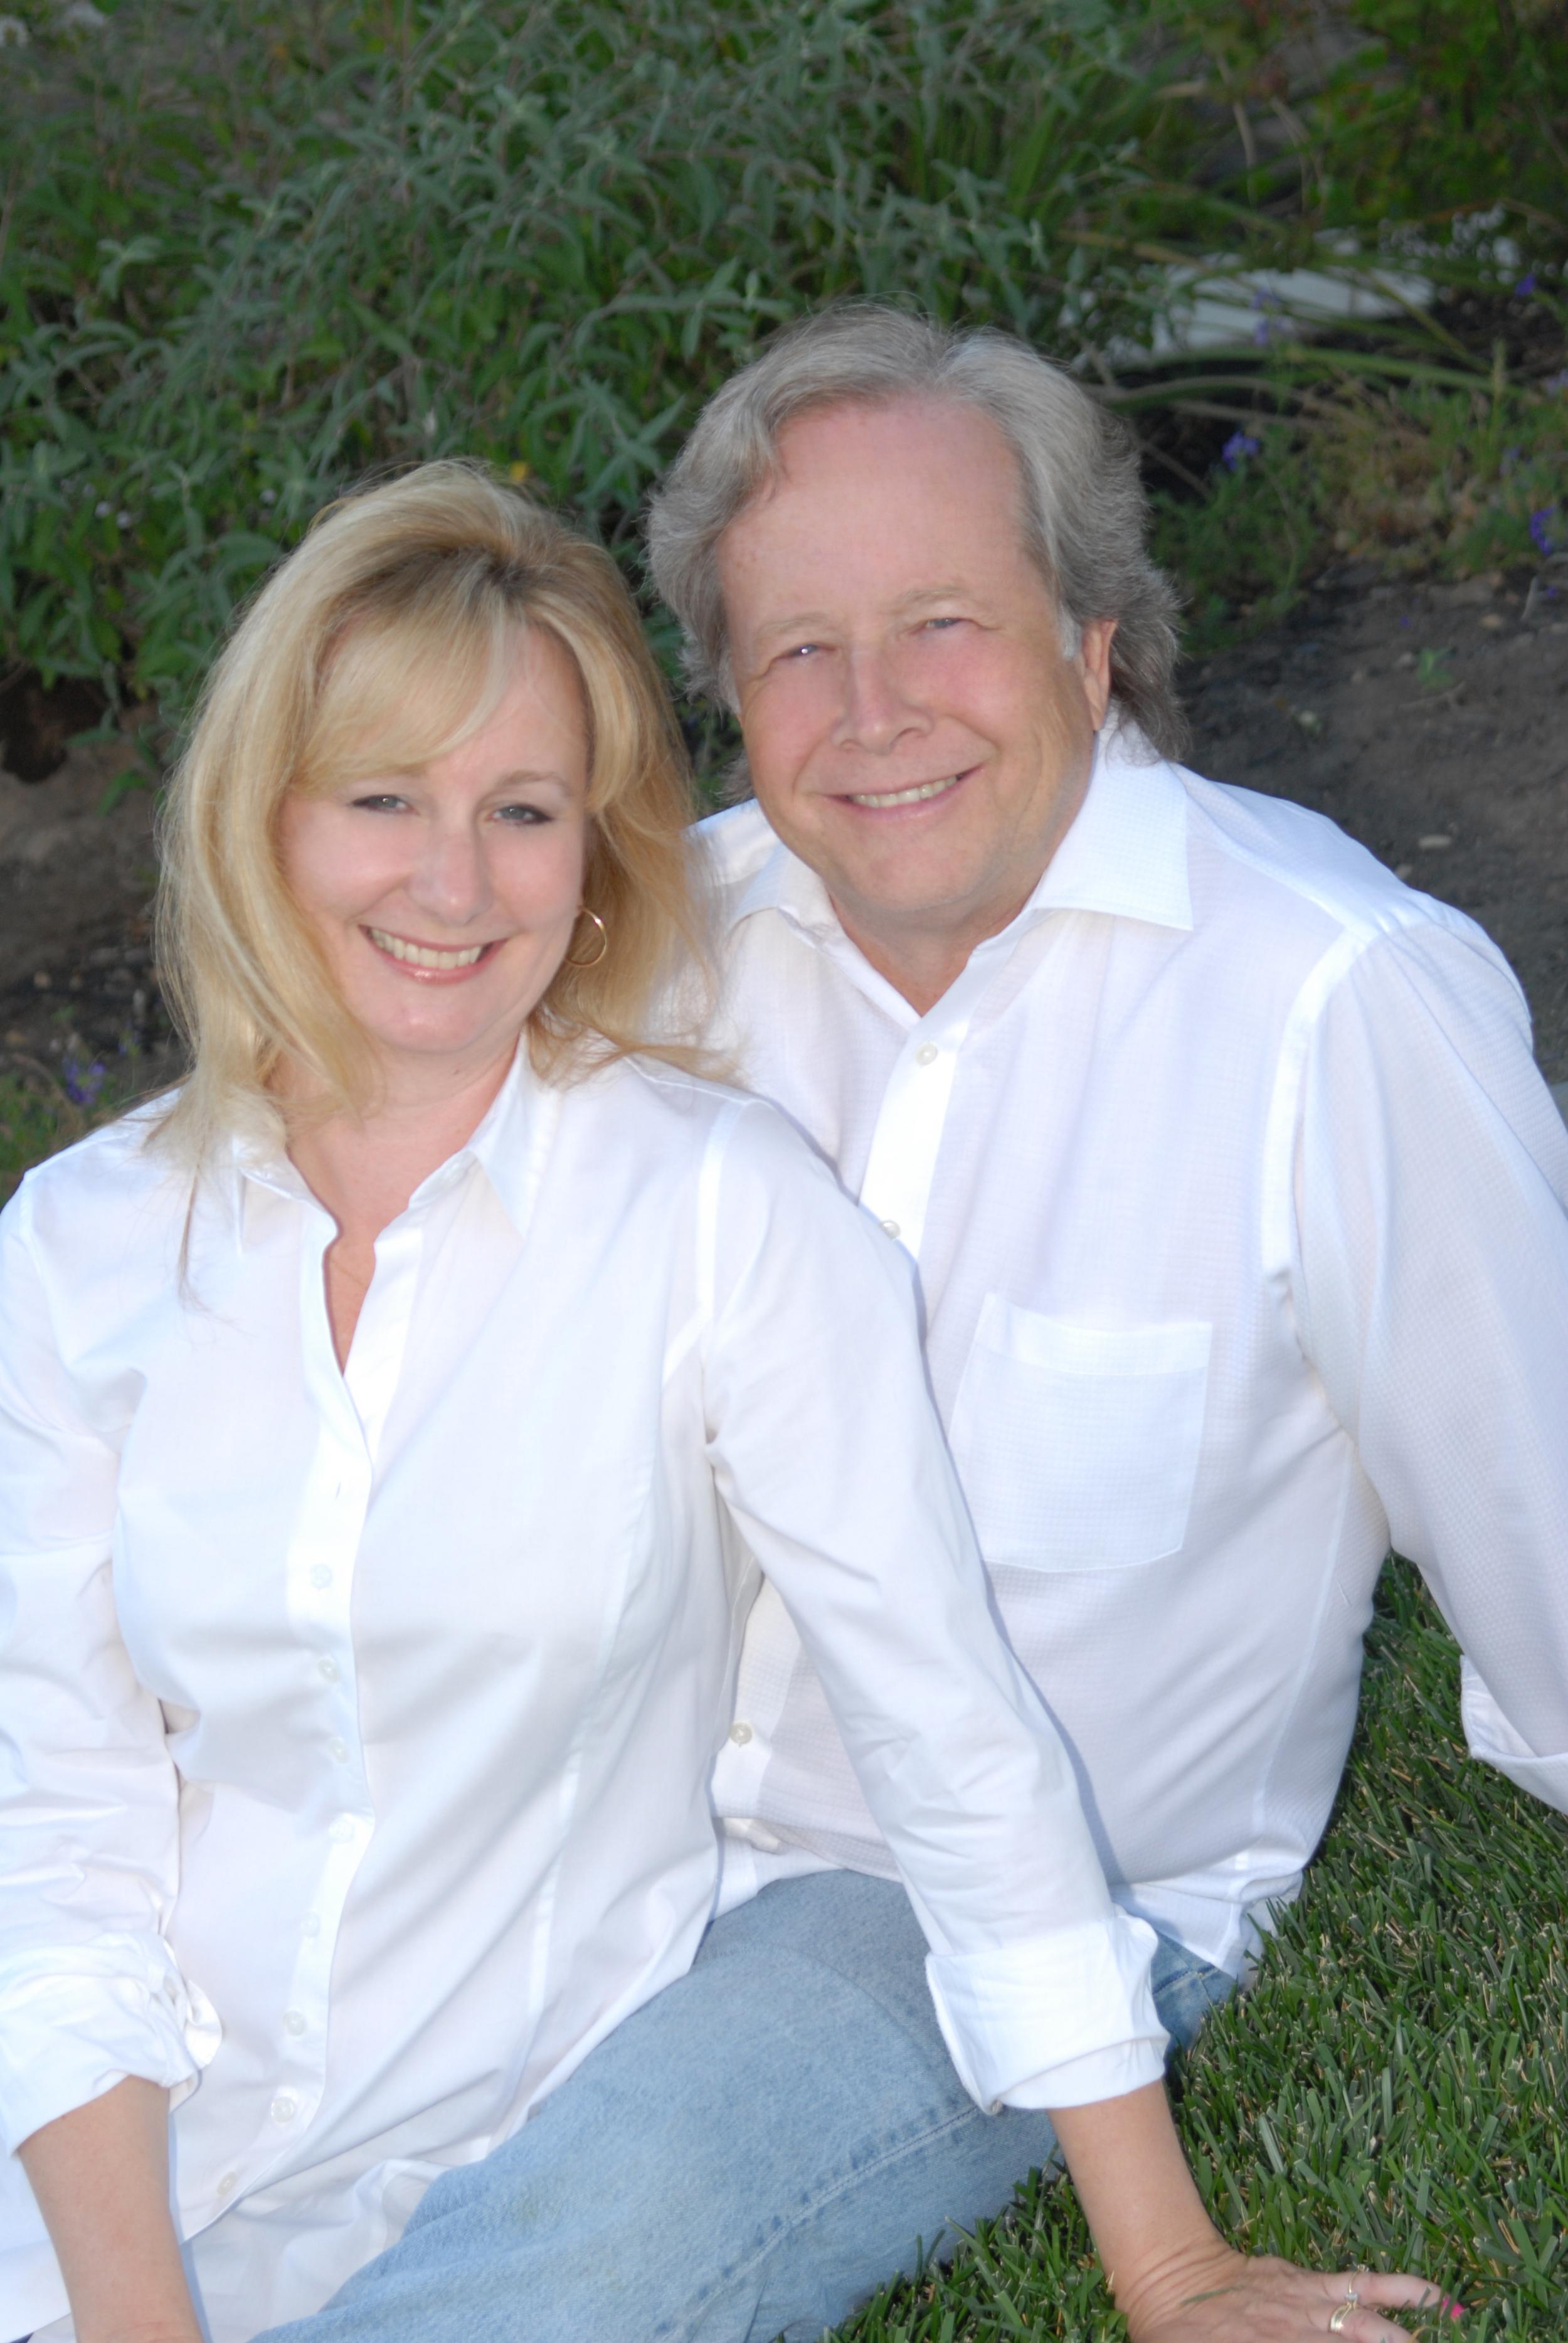 Otis and Julie photo